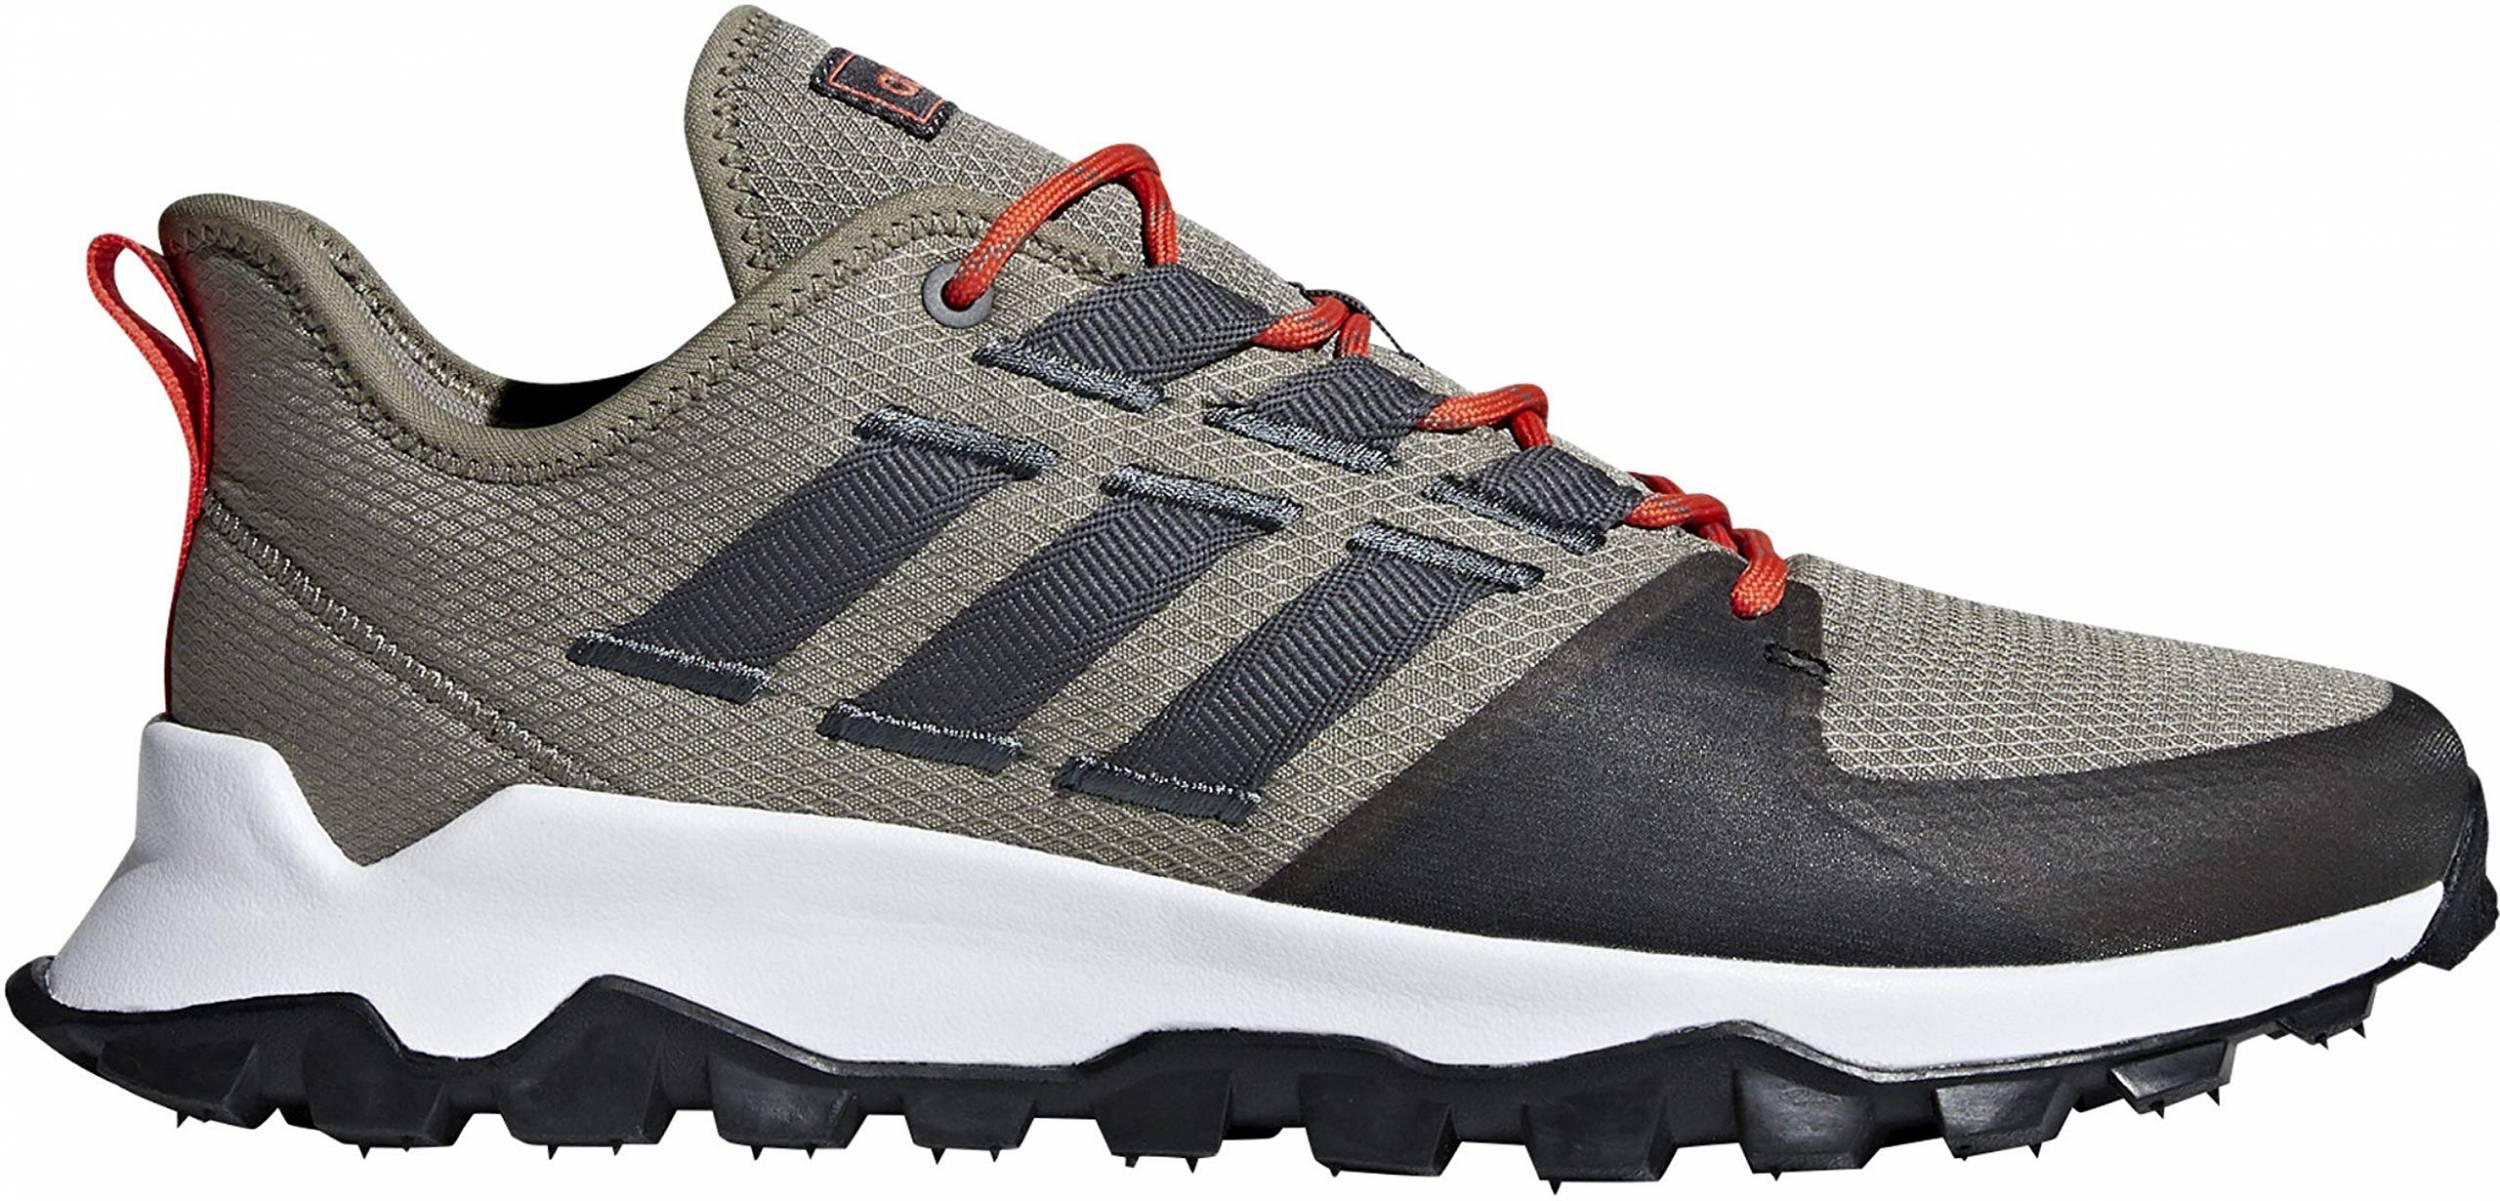 persona que practica jogging Enumerar Tahití  Adidas Kanadia Trail - Deals ($60), Facts, Reviews (2021) | RunRepeat